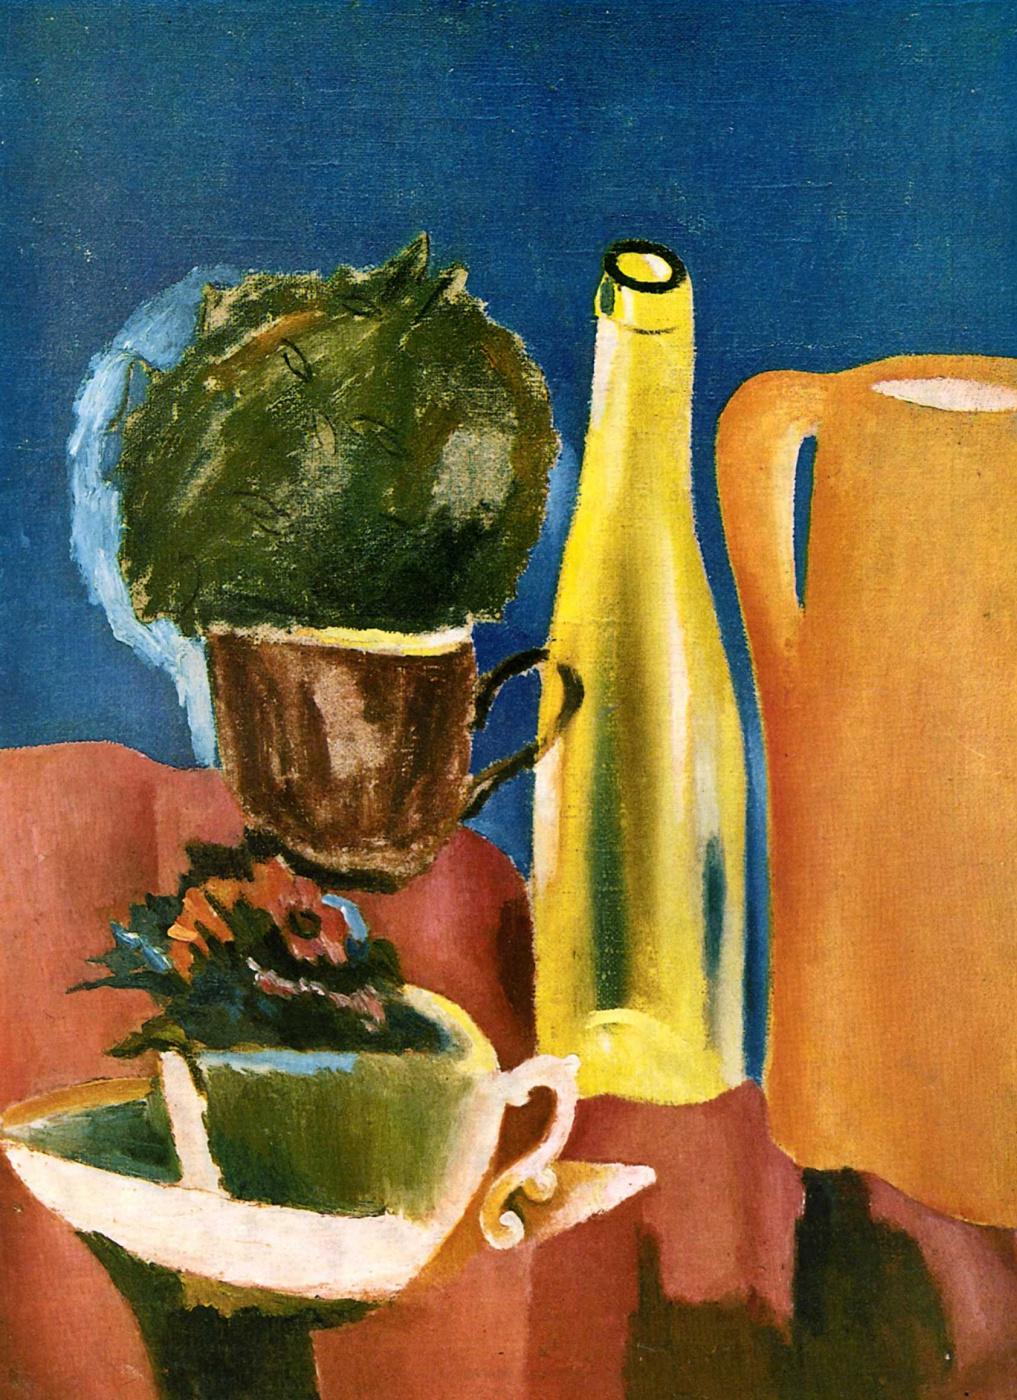 Lev Alexandrovich Yudin. Orange jug and bottle